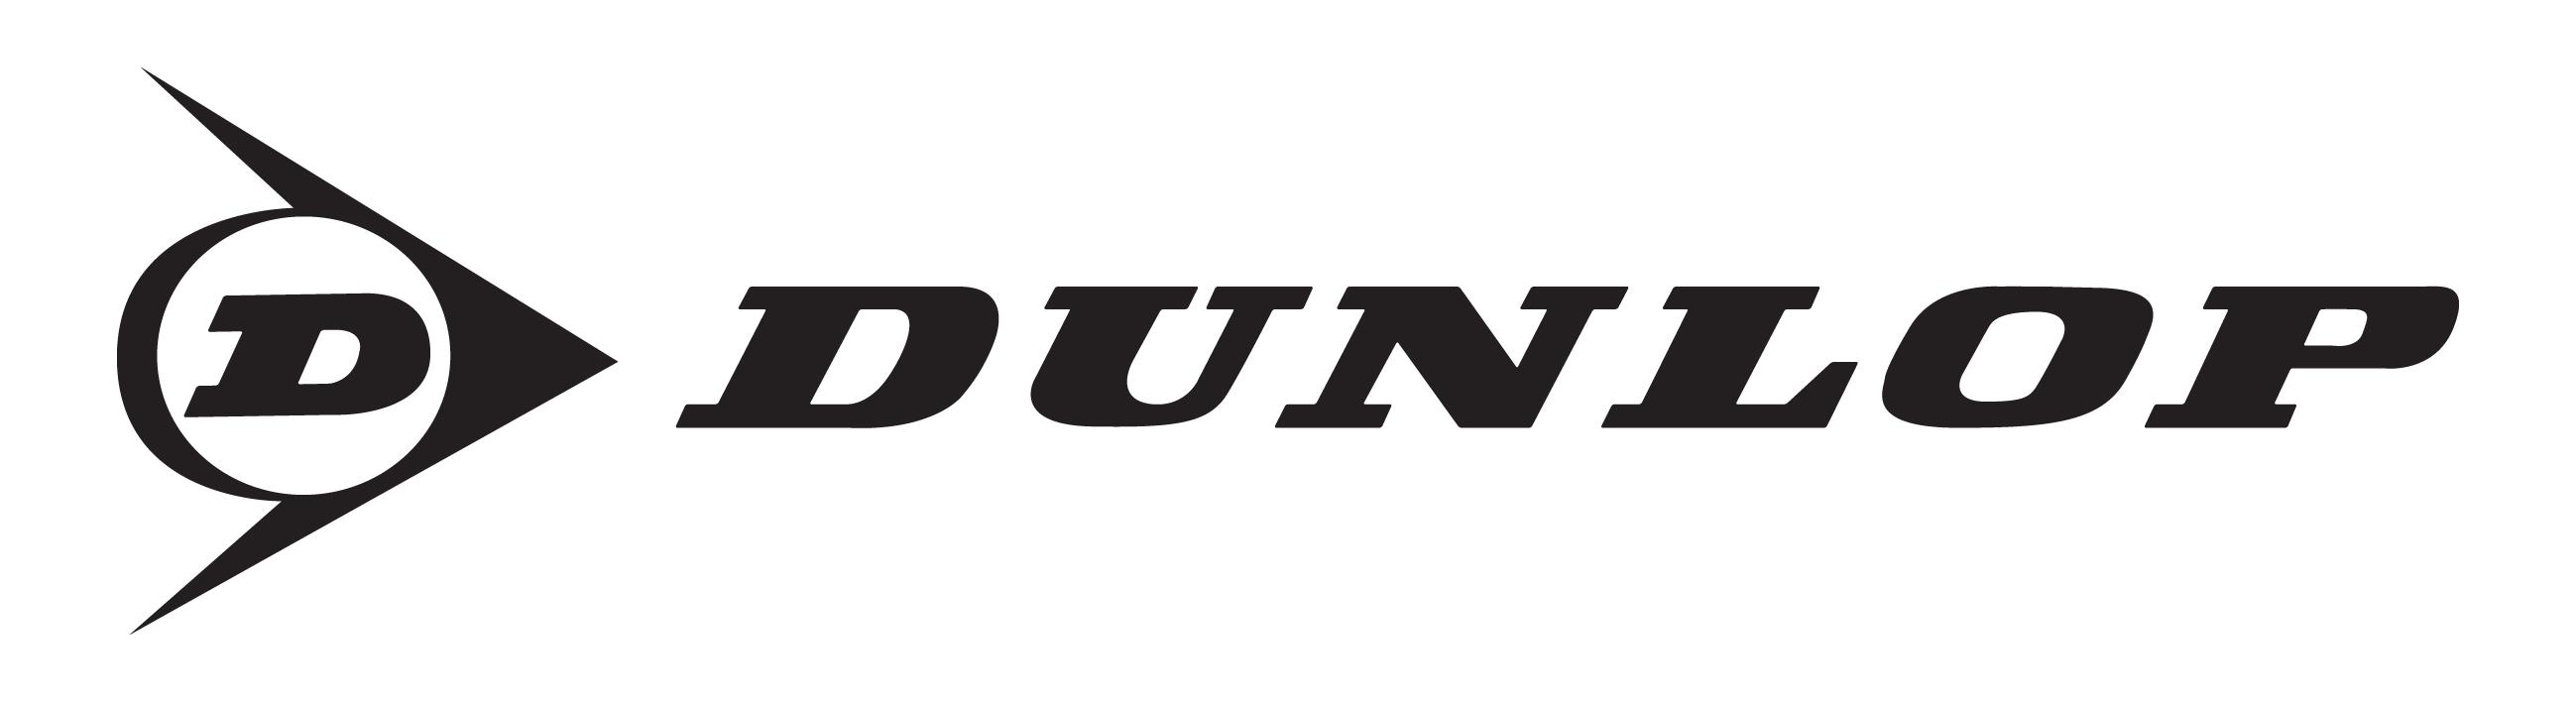 Dunlop PNG - 110423